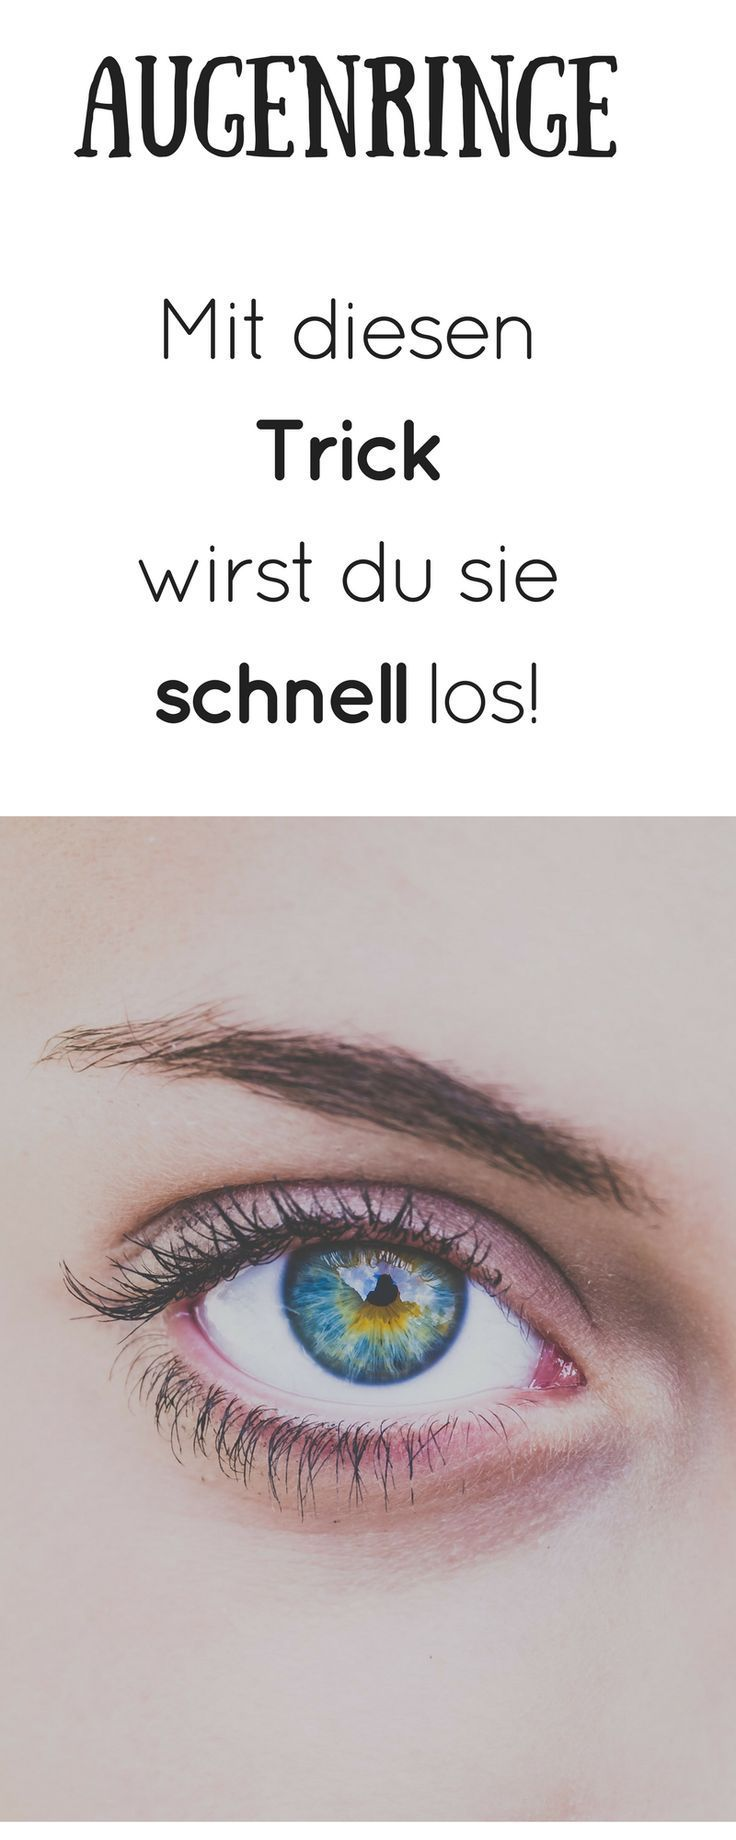 Meine Besten 7 Hausmittel Gegen Augenringe Augenringe Entfernen Augenringe Hau Schonheit About Augenringe Hausmittel Augenringe Augenringe Entfernen